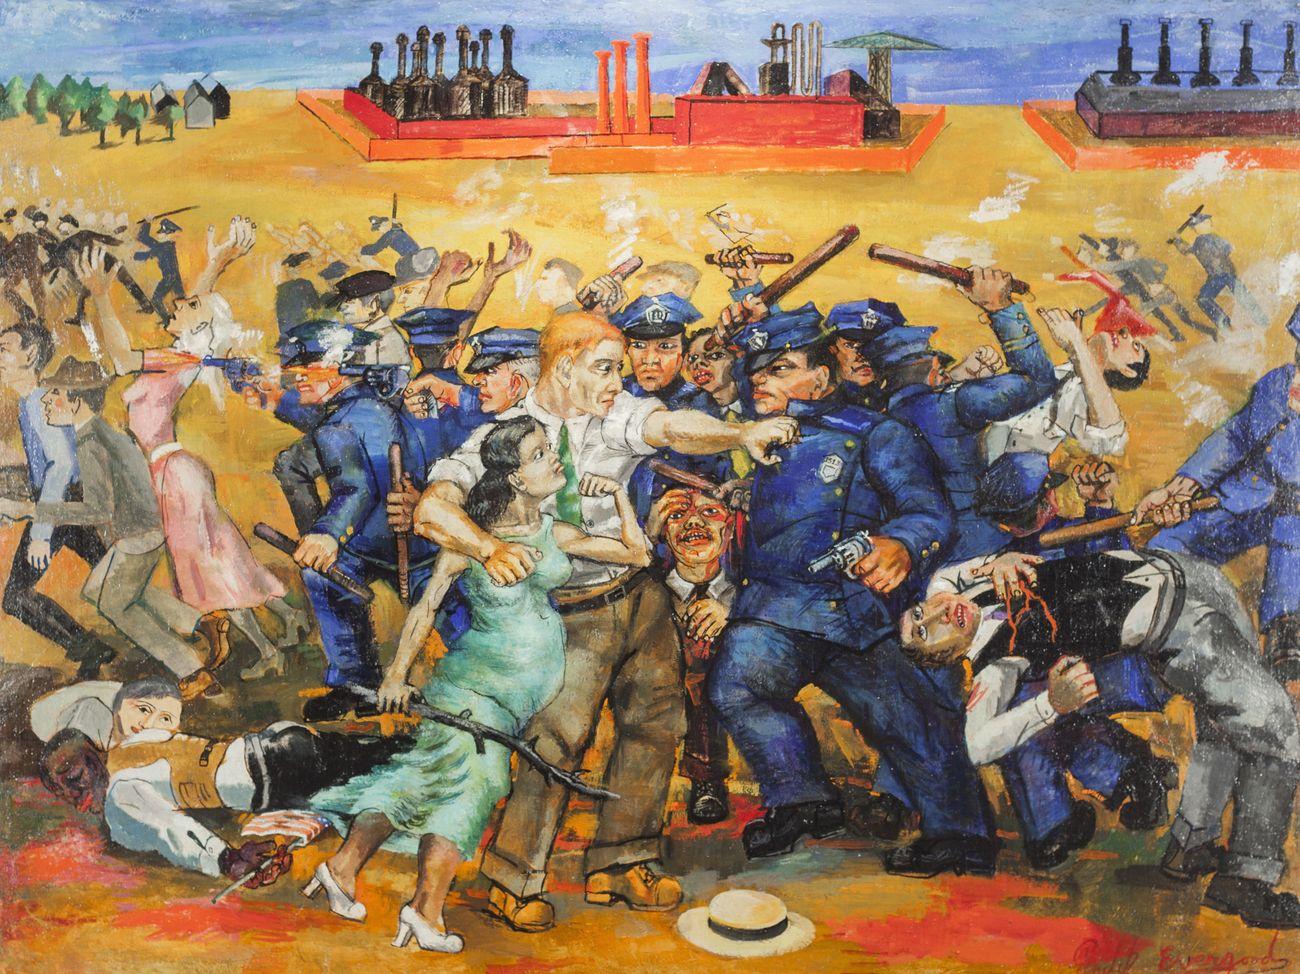 Philip Evergood, American Tragedy, 1937. Courtesy Harvey and Harvey Ann Ross